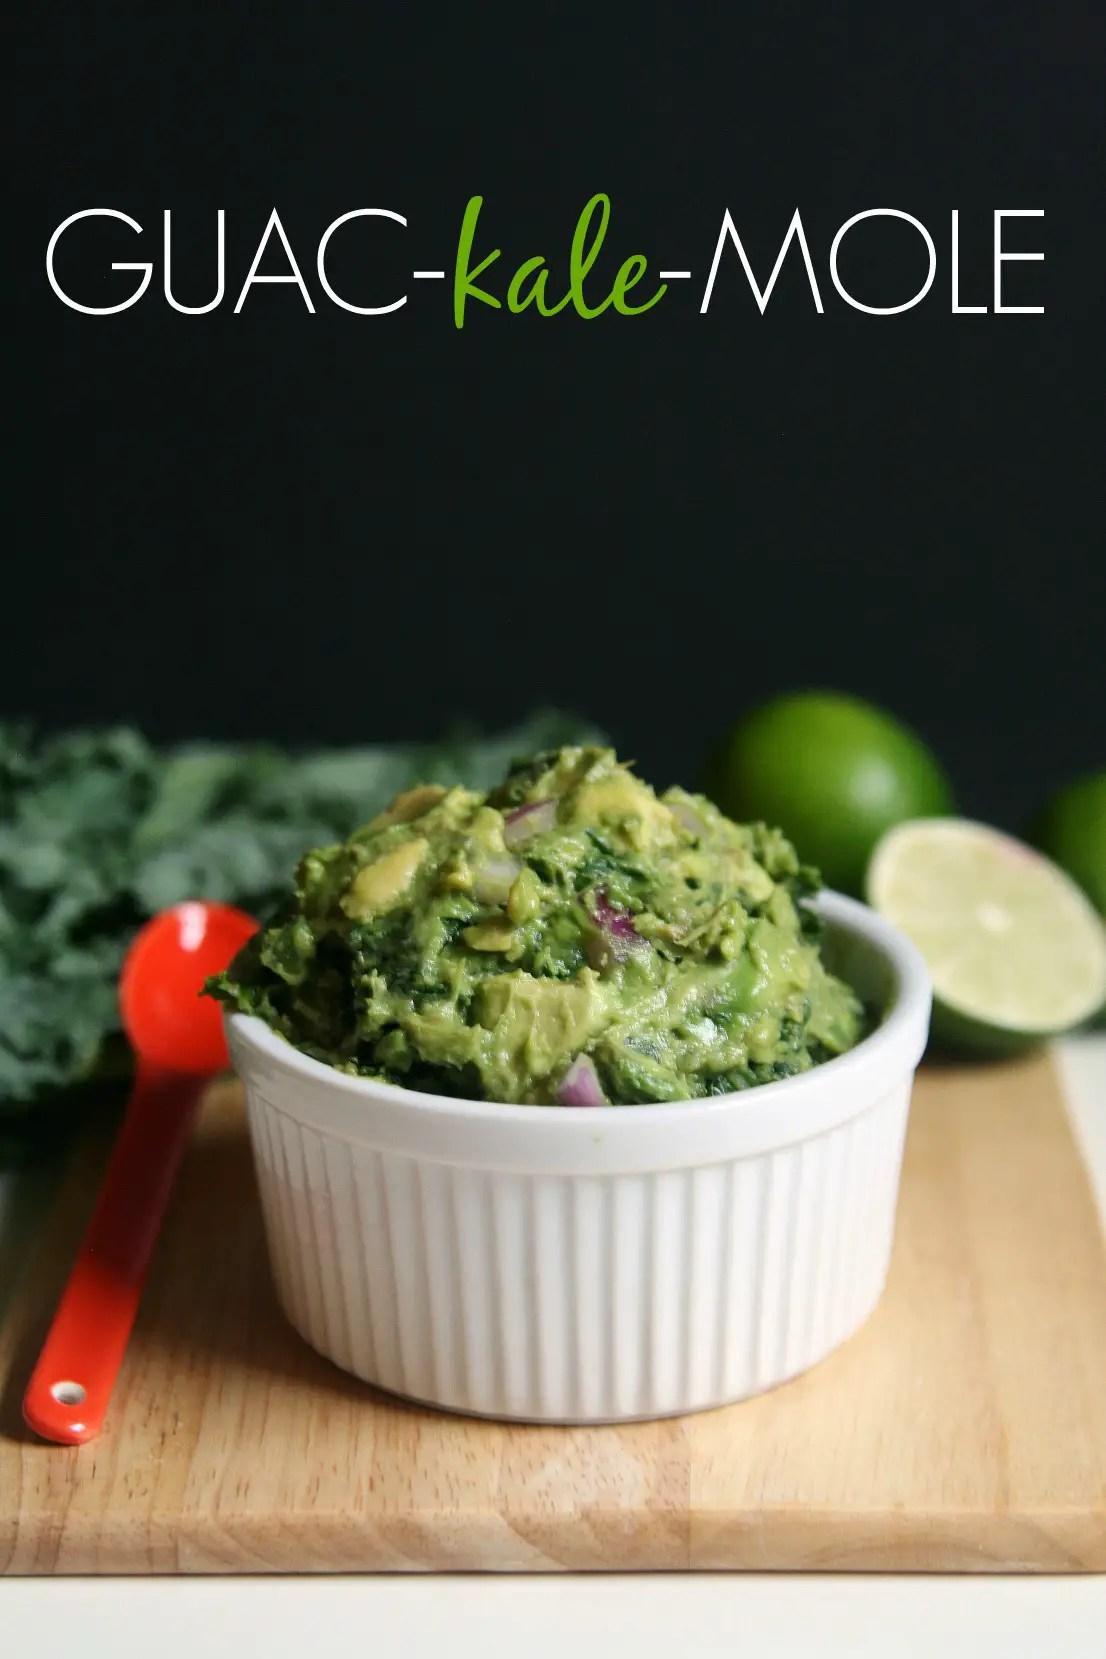 guac-kale-mole-4